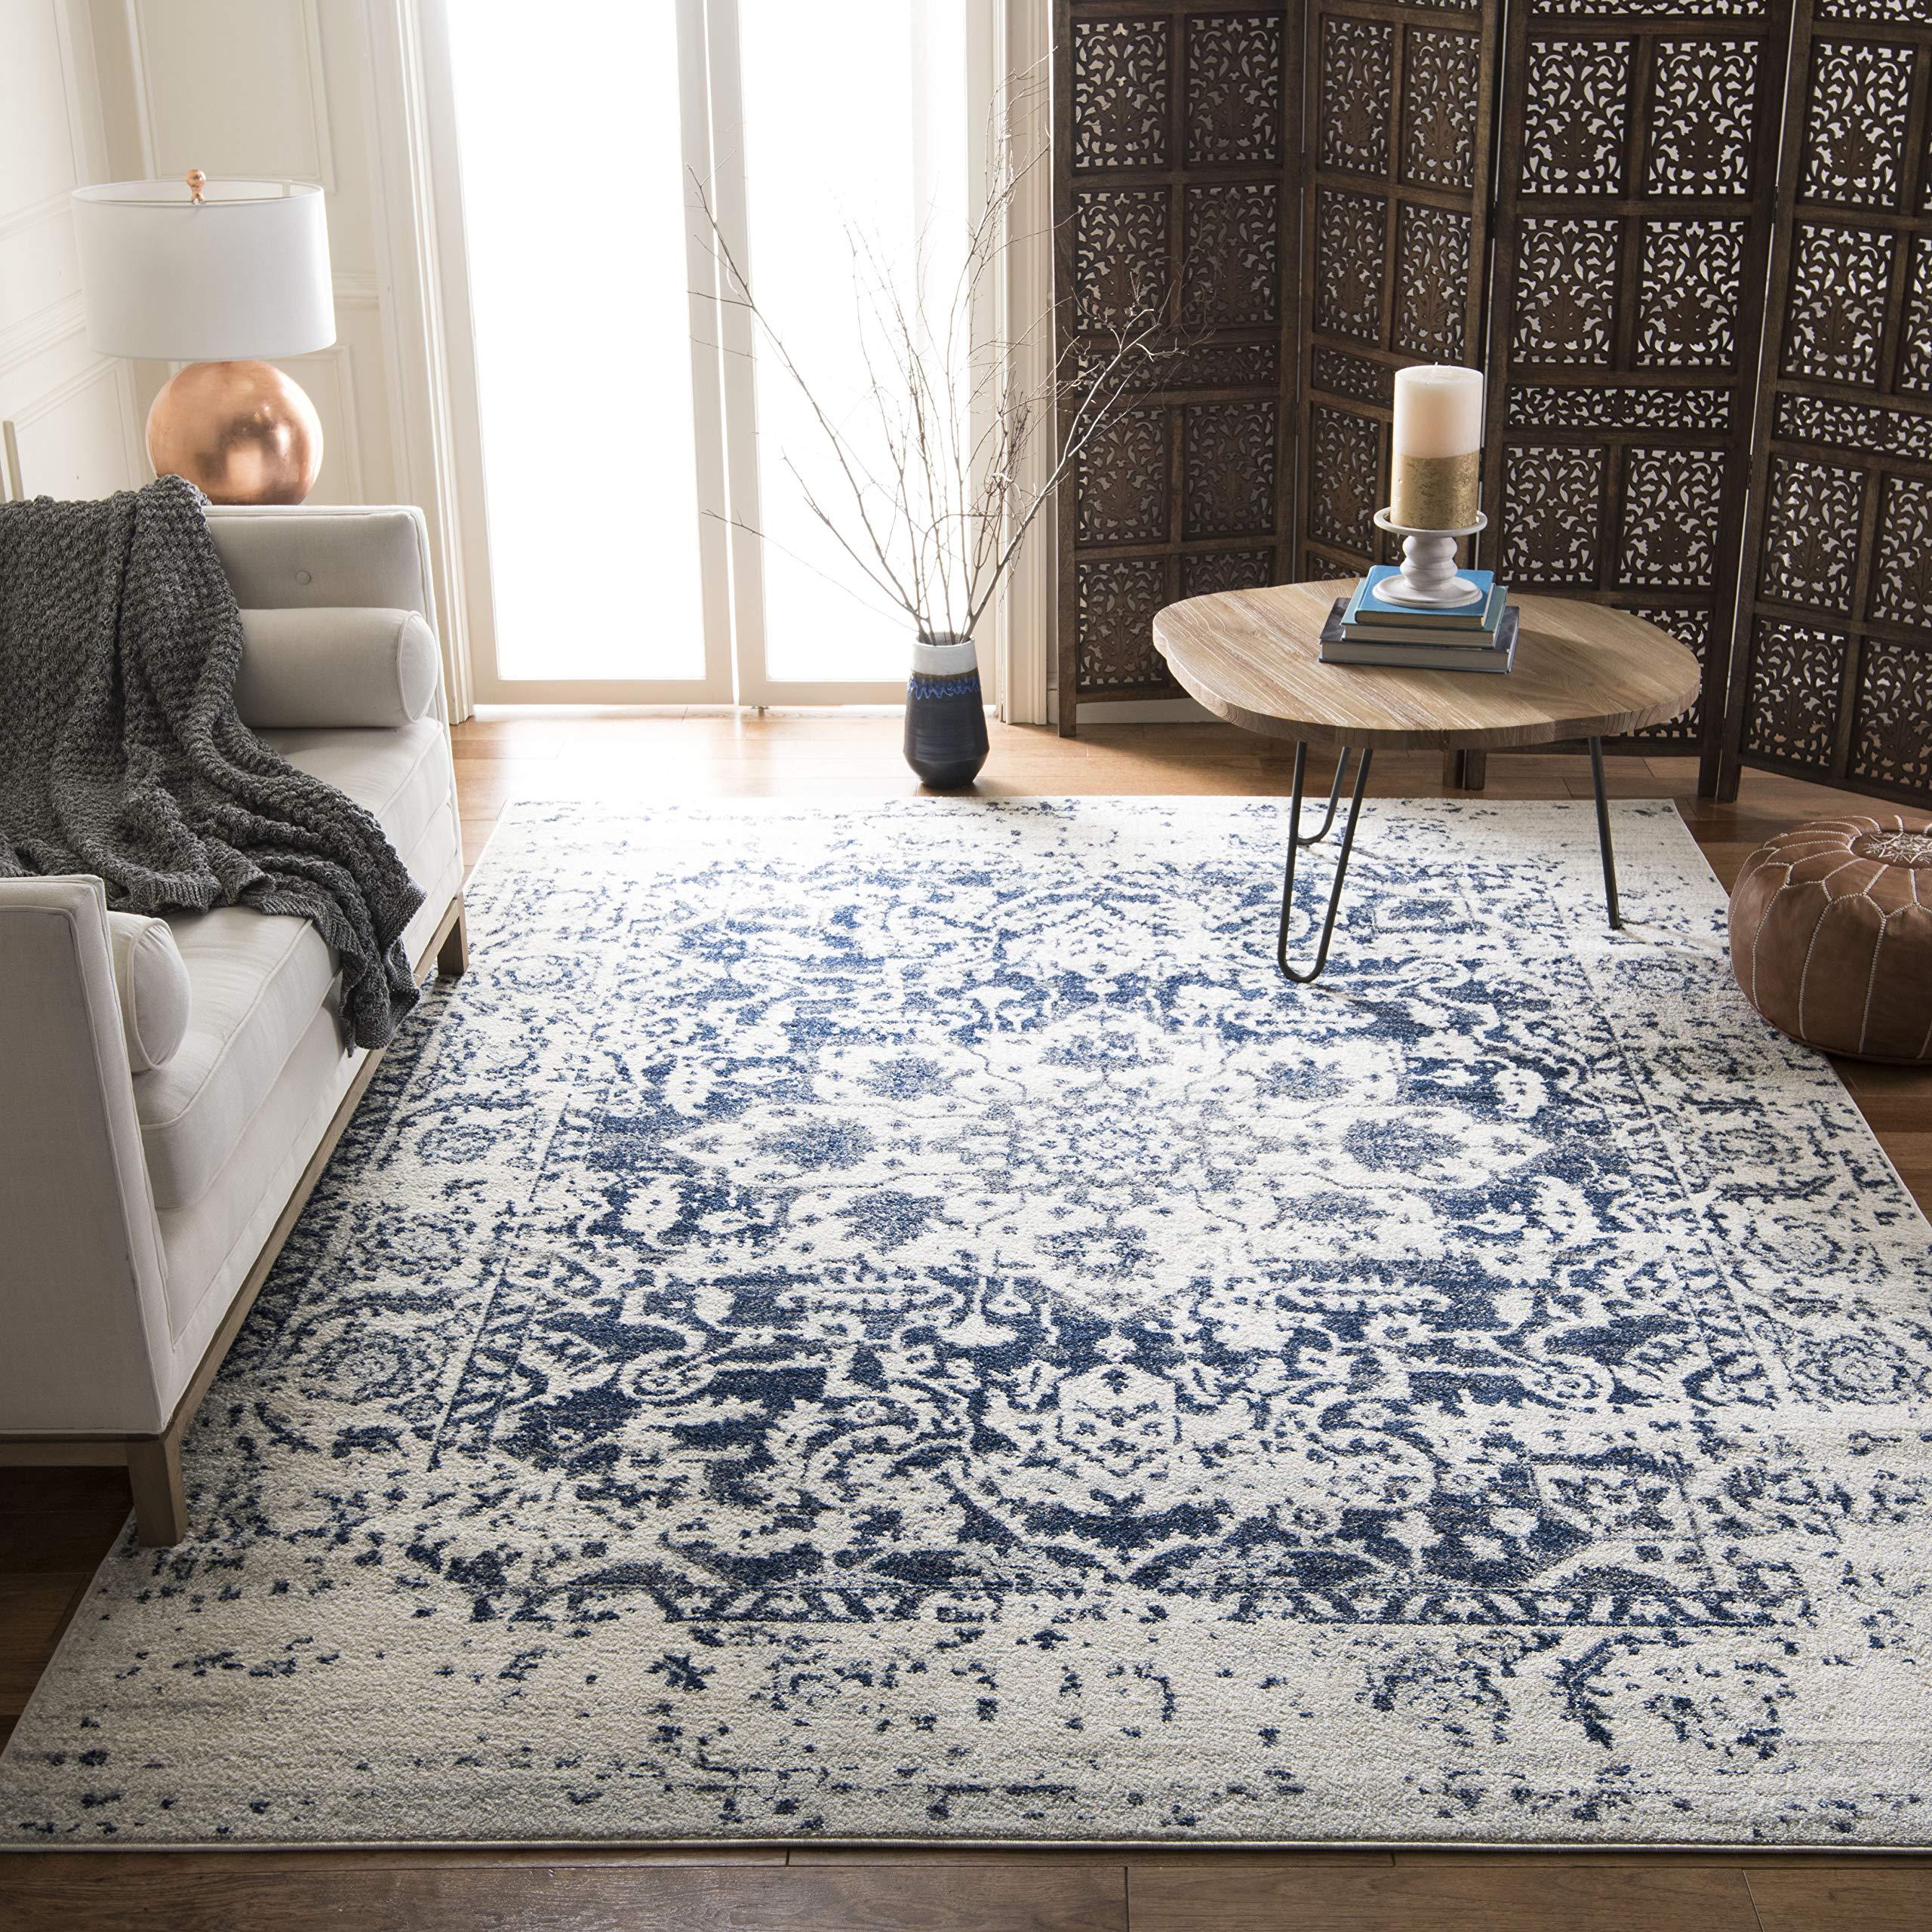 Large living room rug 9x12 feet destressed area rug - Huge living room rugs ...